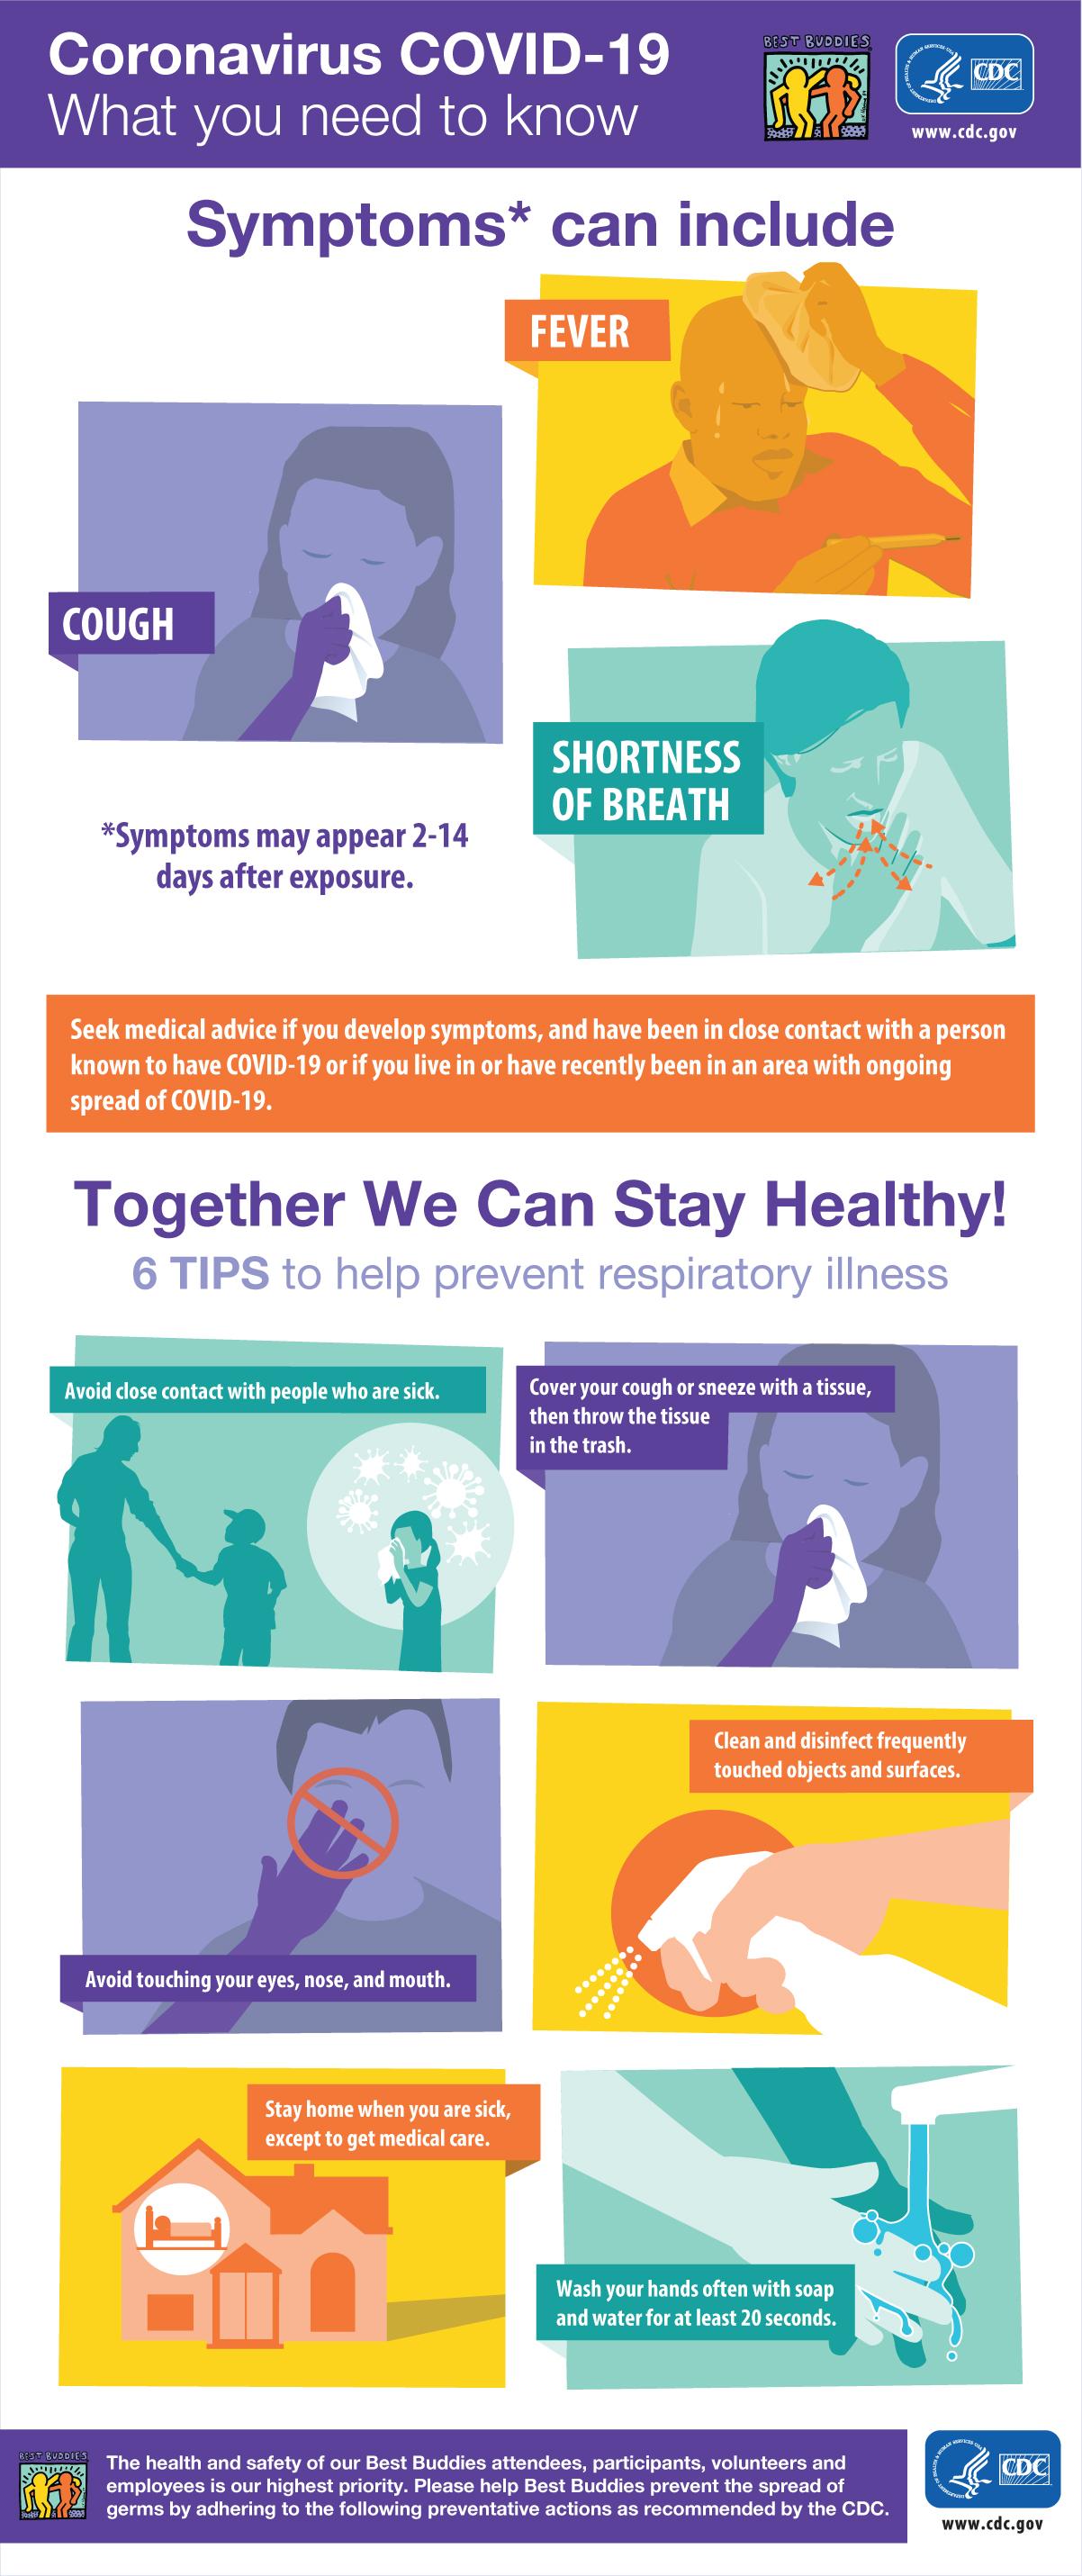 Coronavirus symptoms and prevention tips